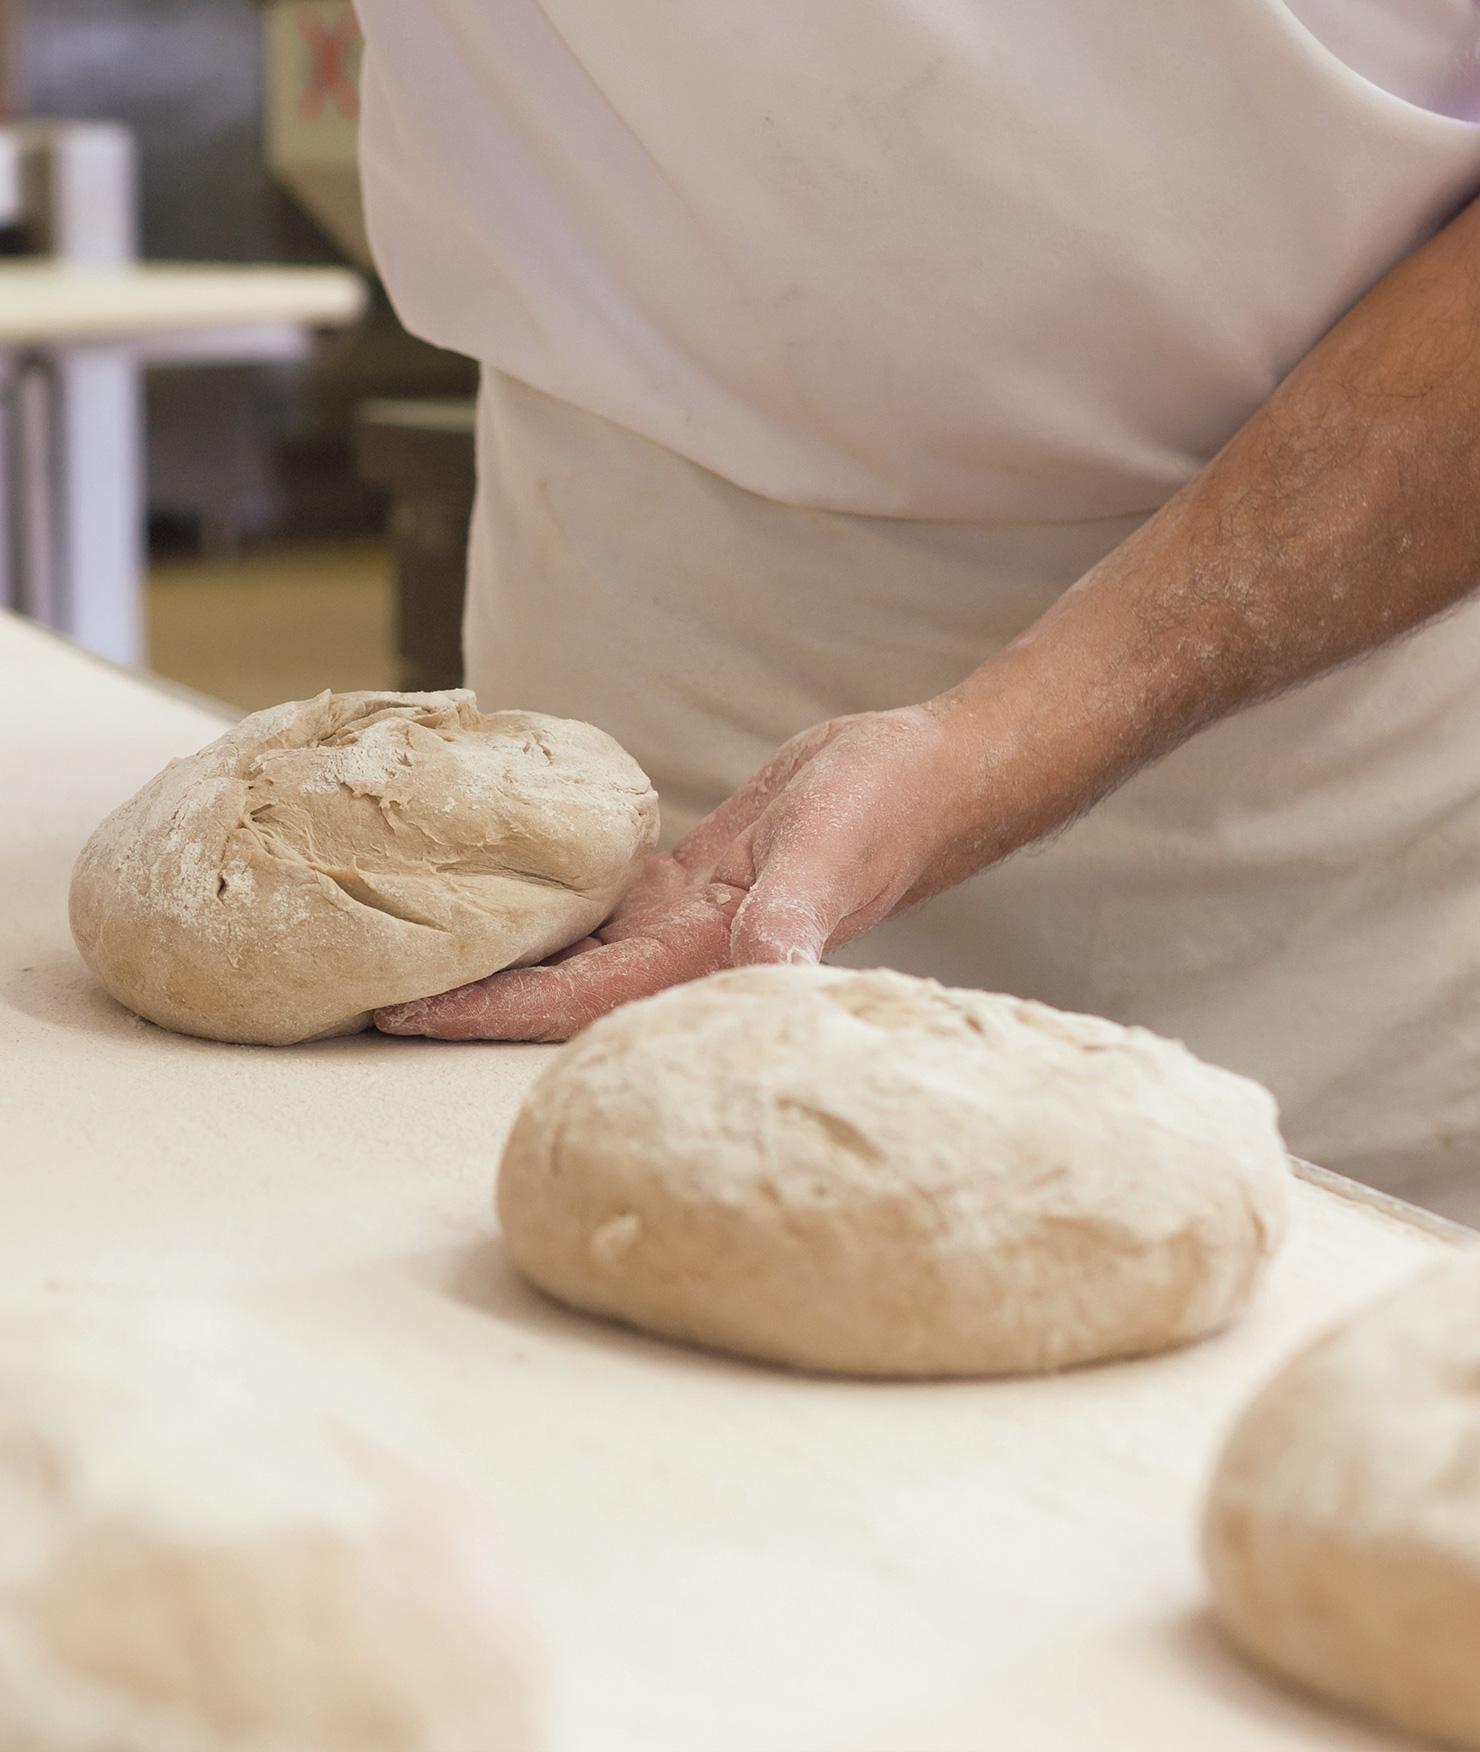 BRITA Filter PURITY Steam Bäckerei Brotbacken